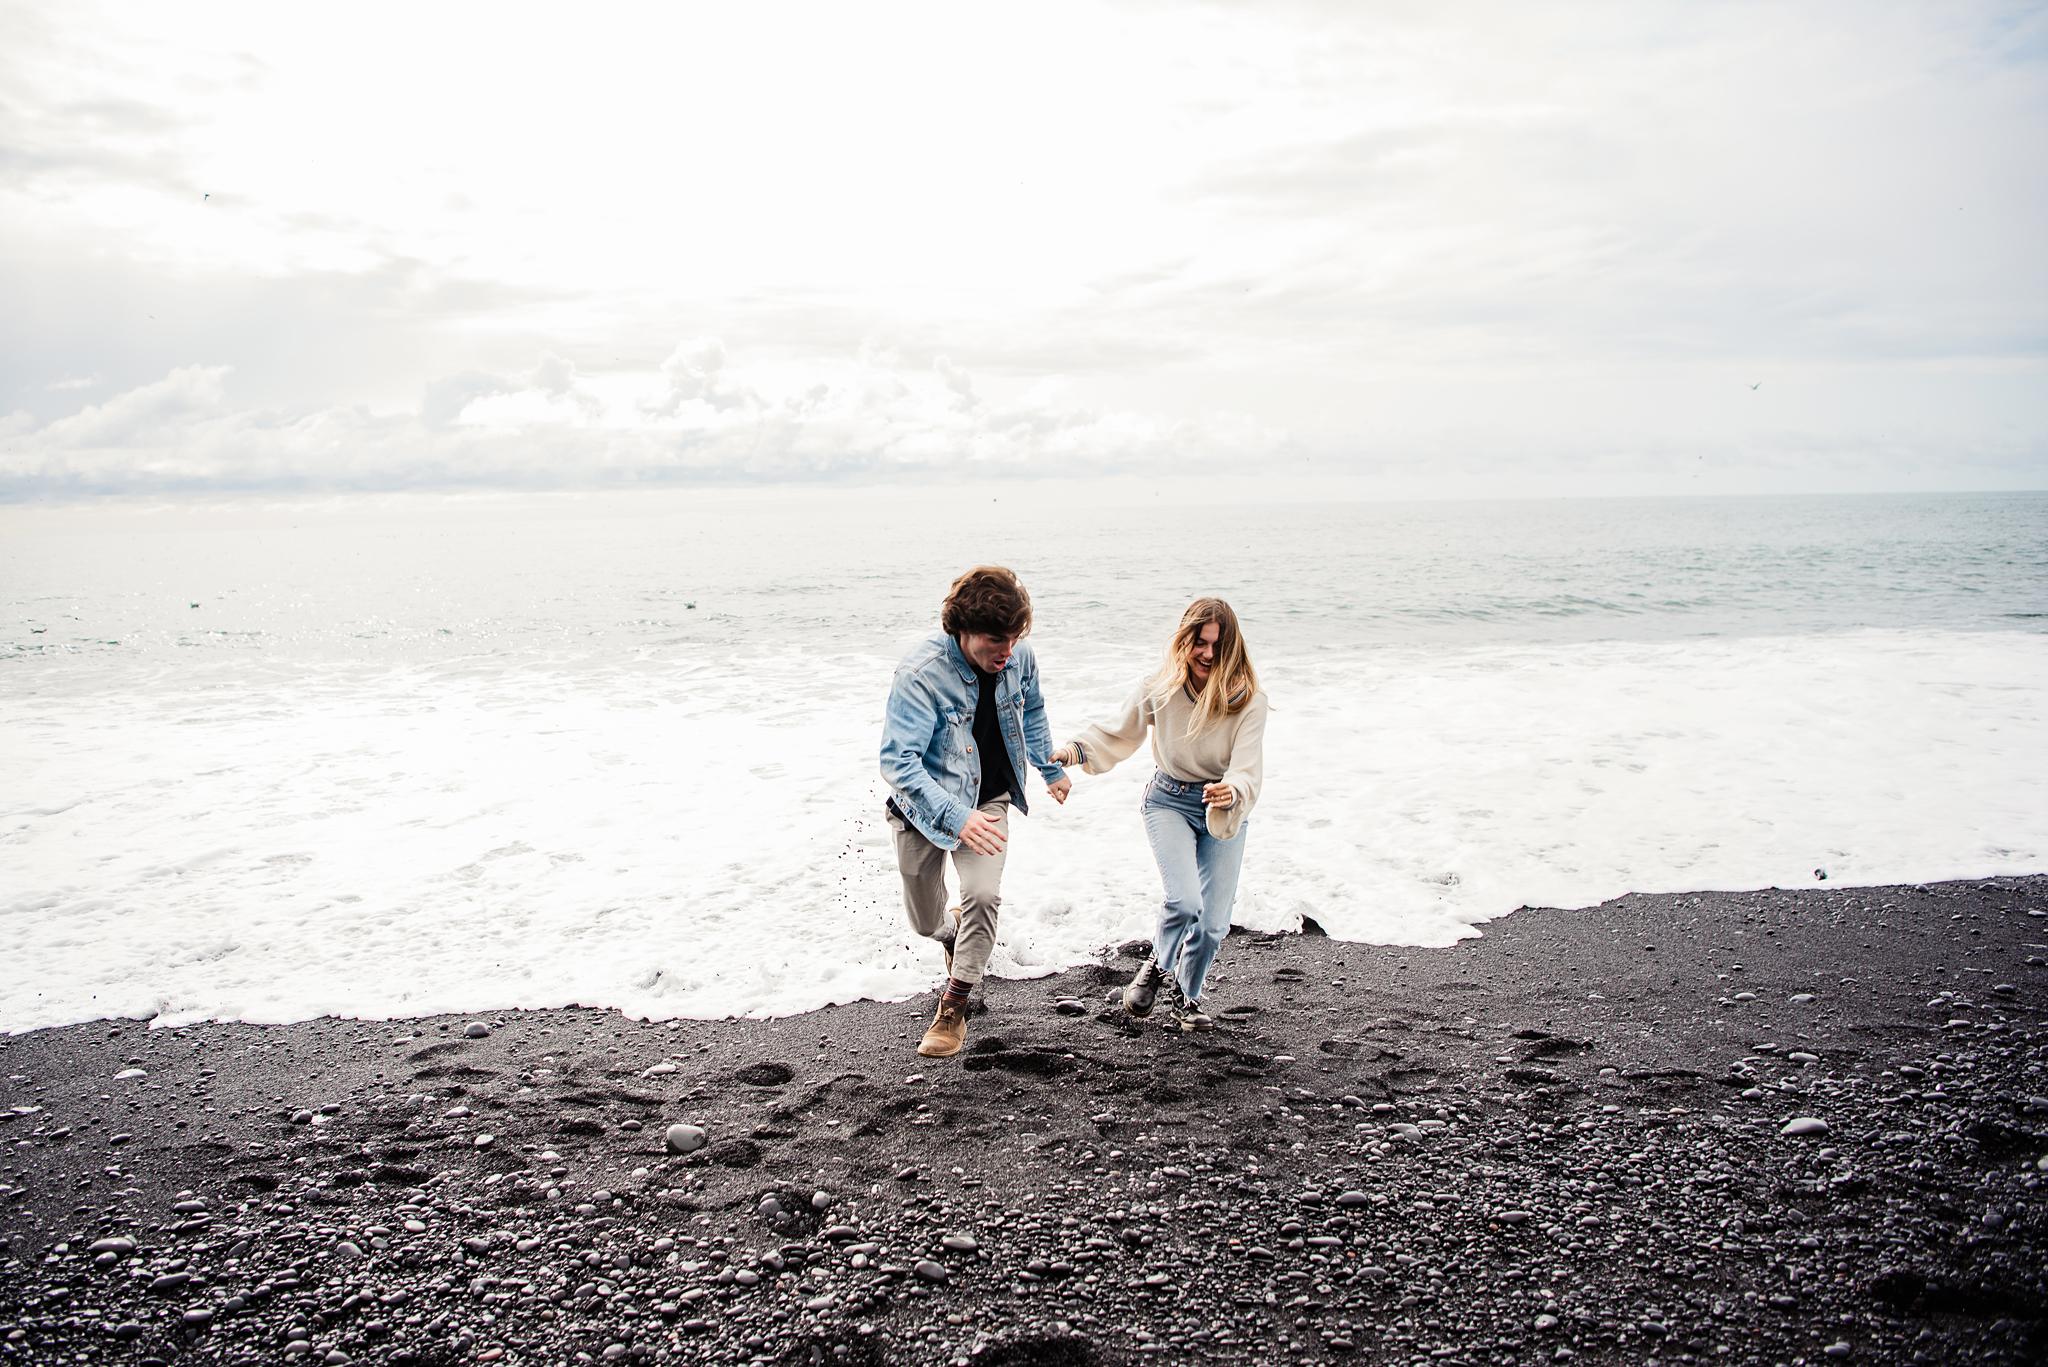 Iceland_Reynisfjara_Black_Sand_Beach_Couples_Session_JILL_STUDIO_Rochester_NY_Photographer_DSC_9712.jpg